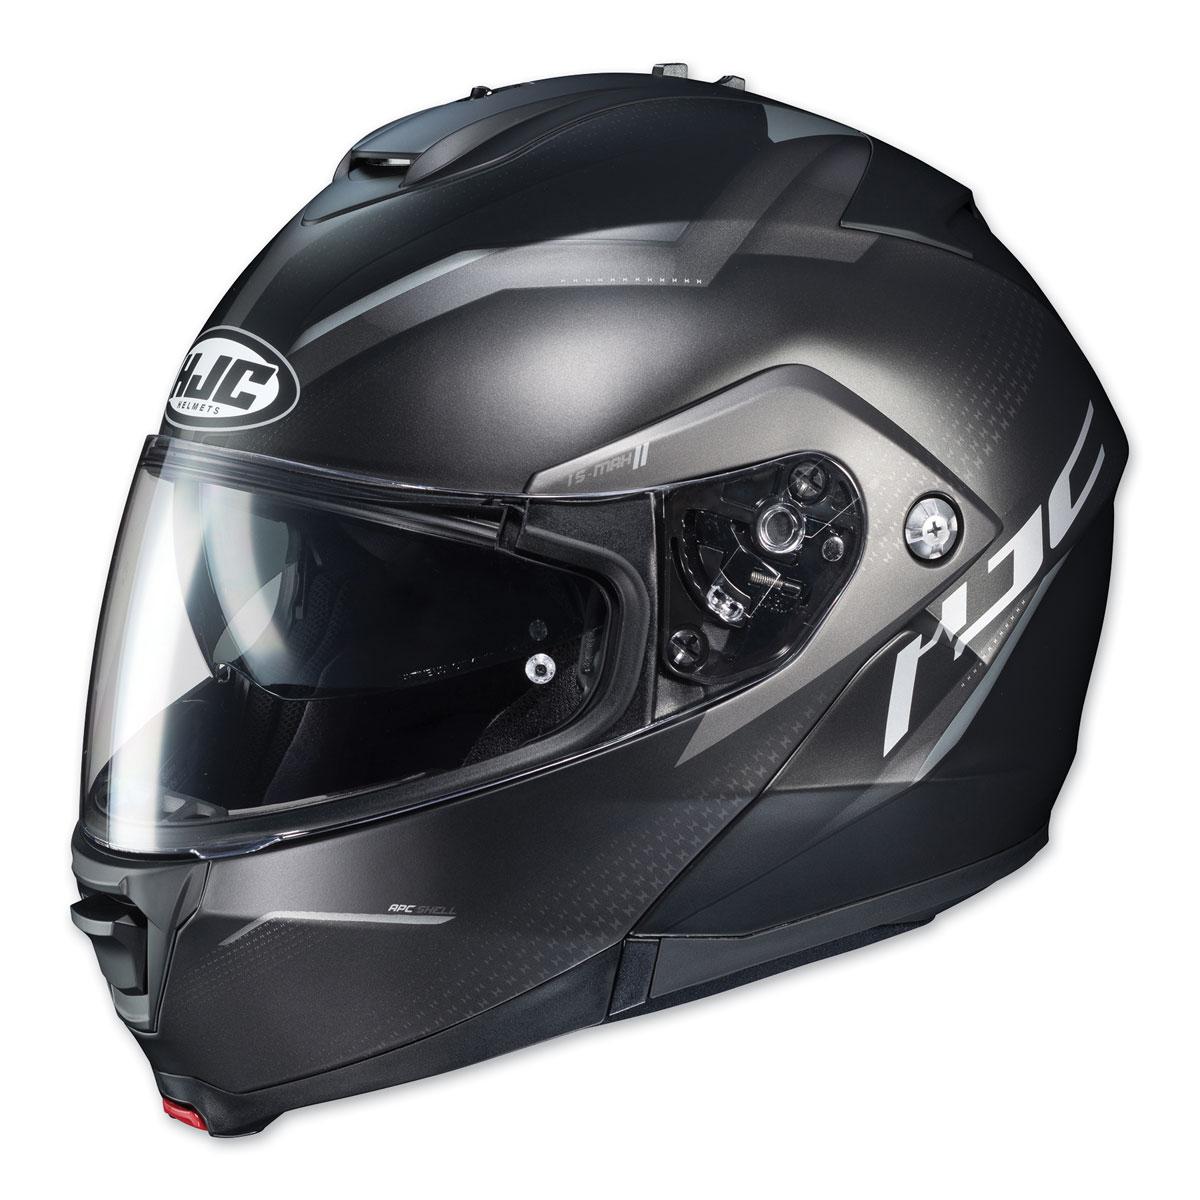 HJC IS-MAX II Dova Black/Gray Modular Helmet